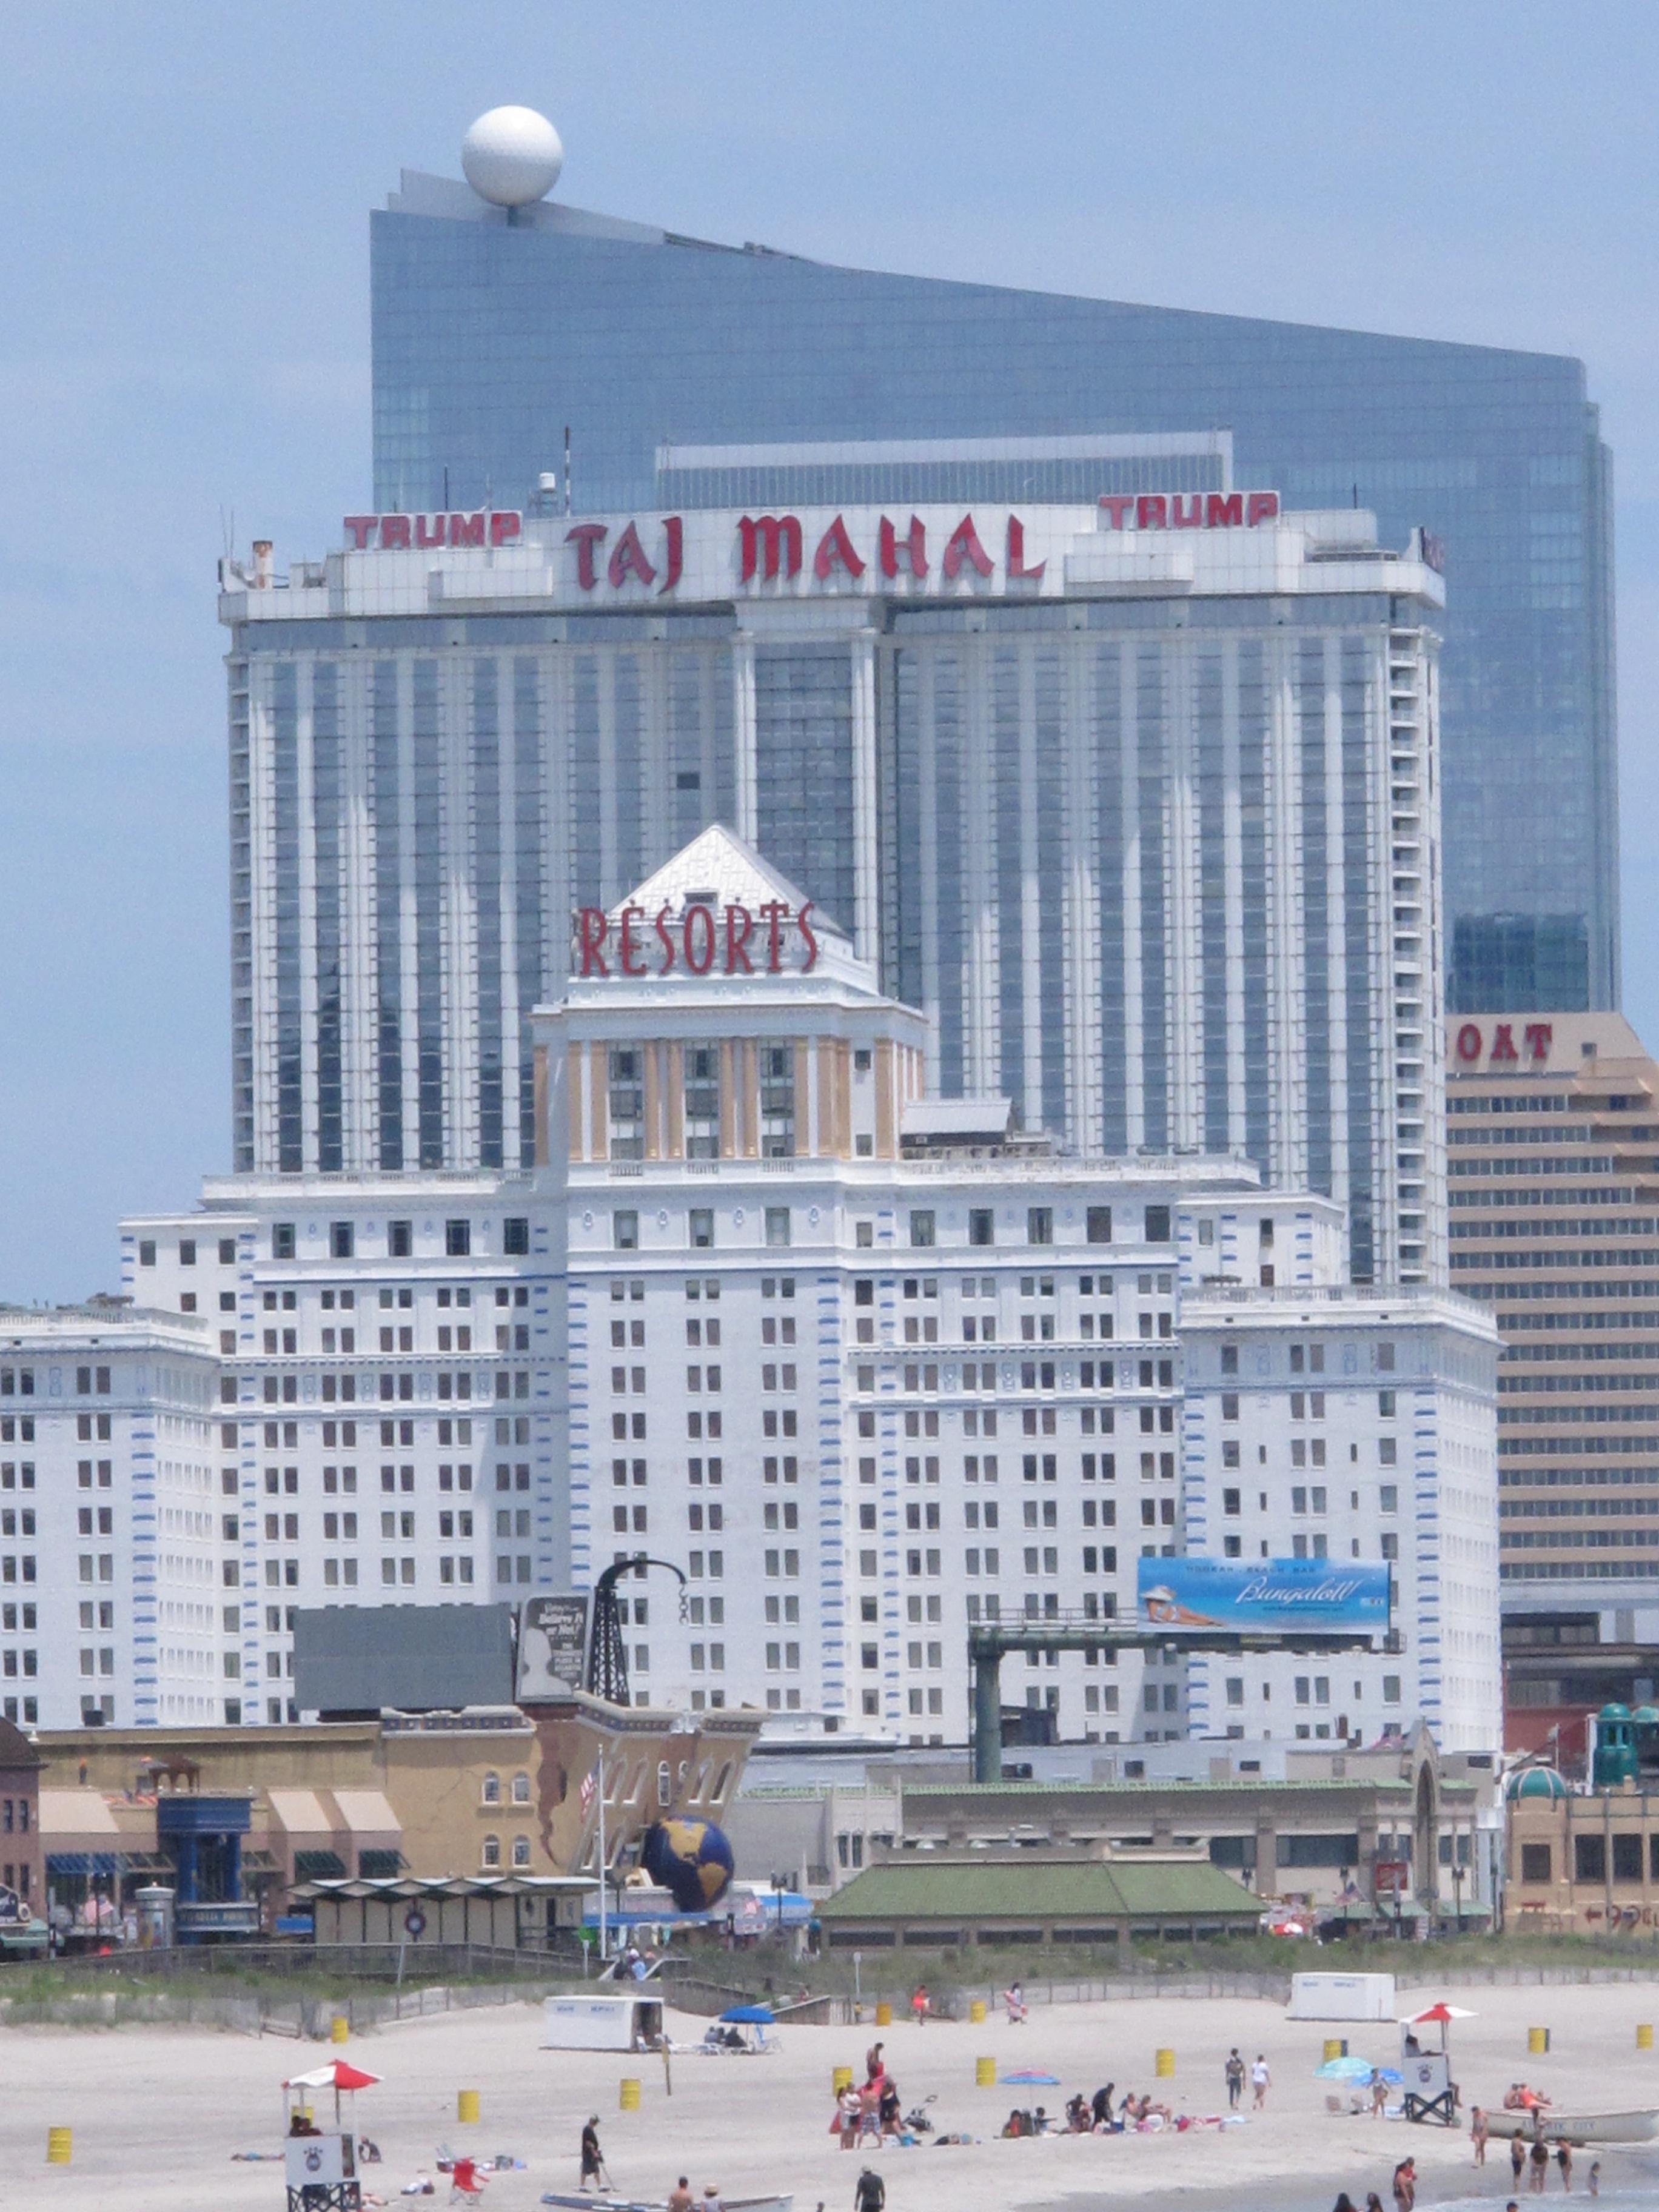 Showboat casino hostage benefits of casino gambling